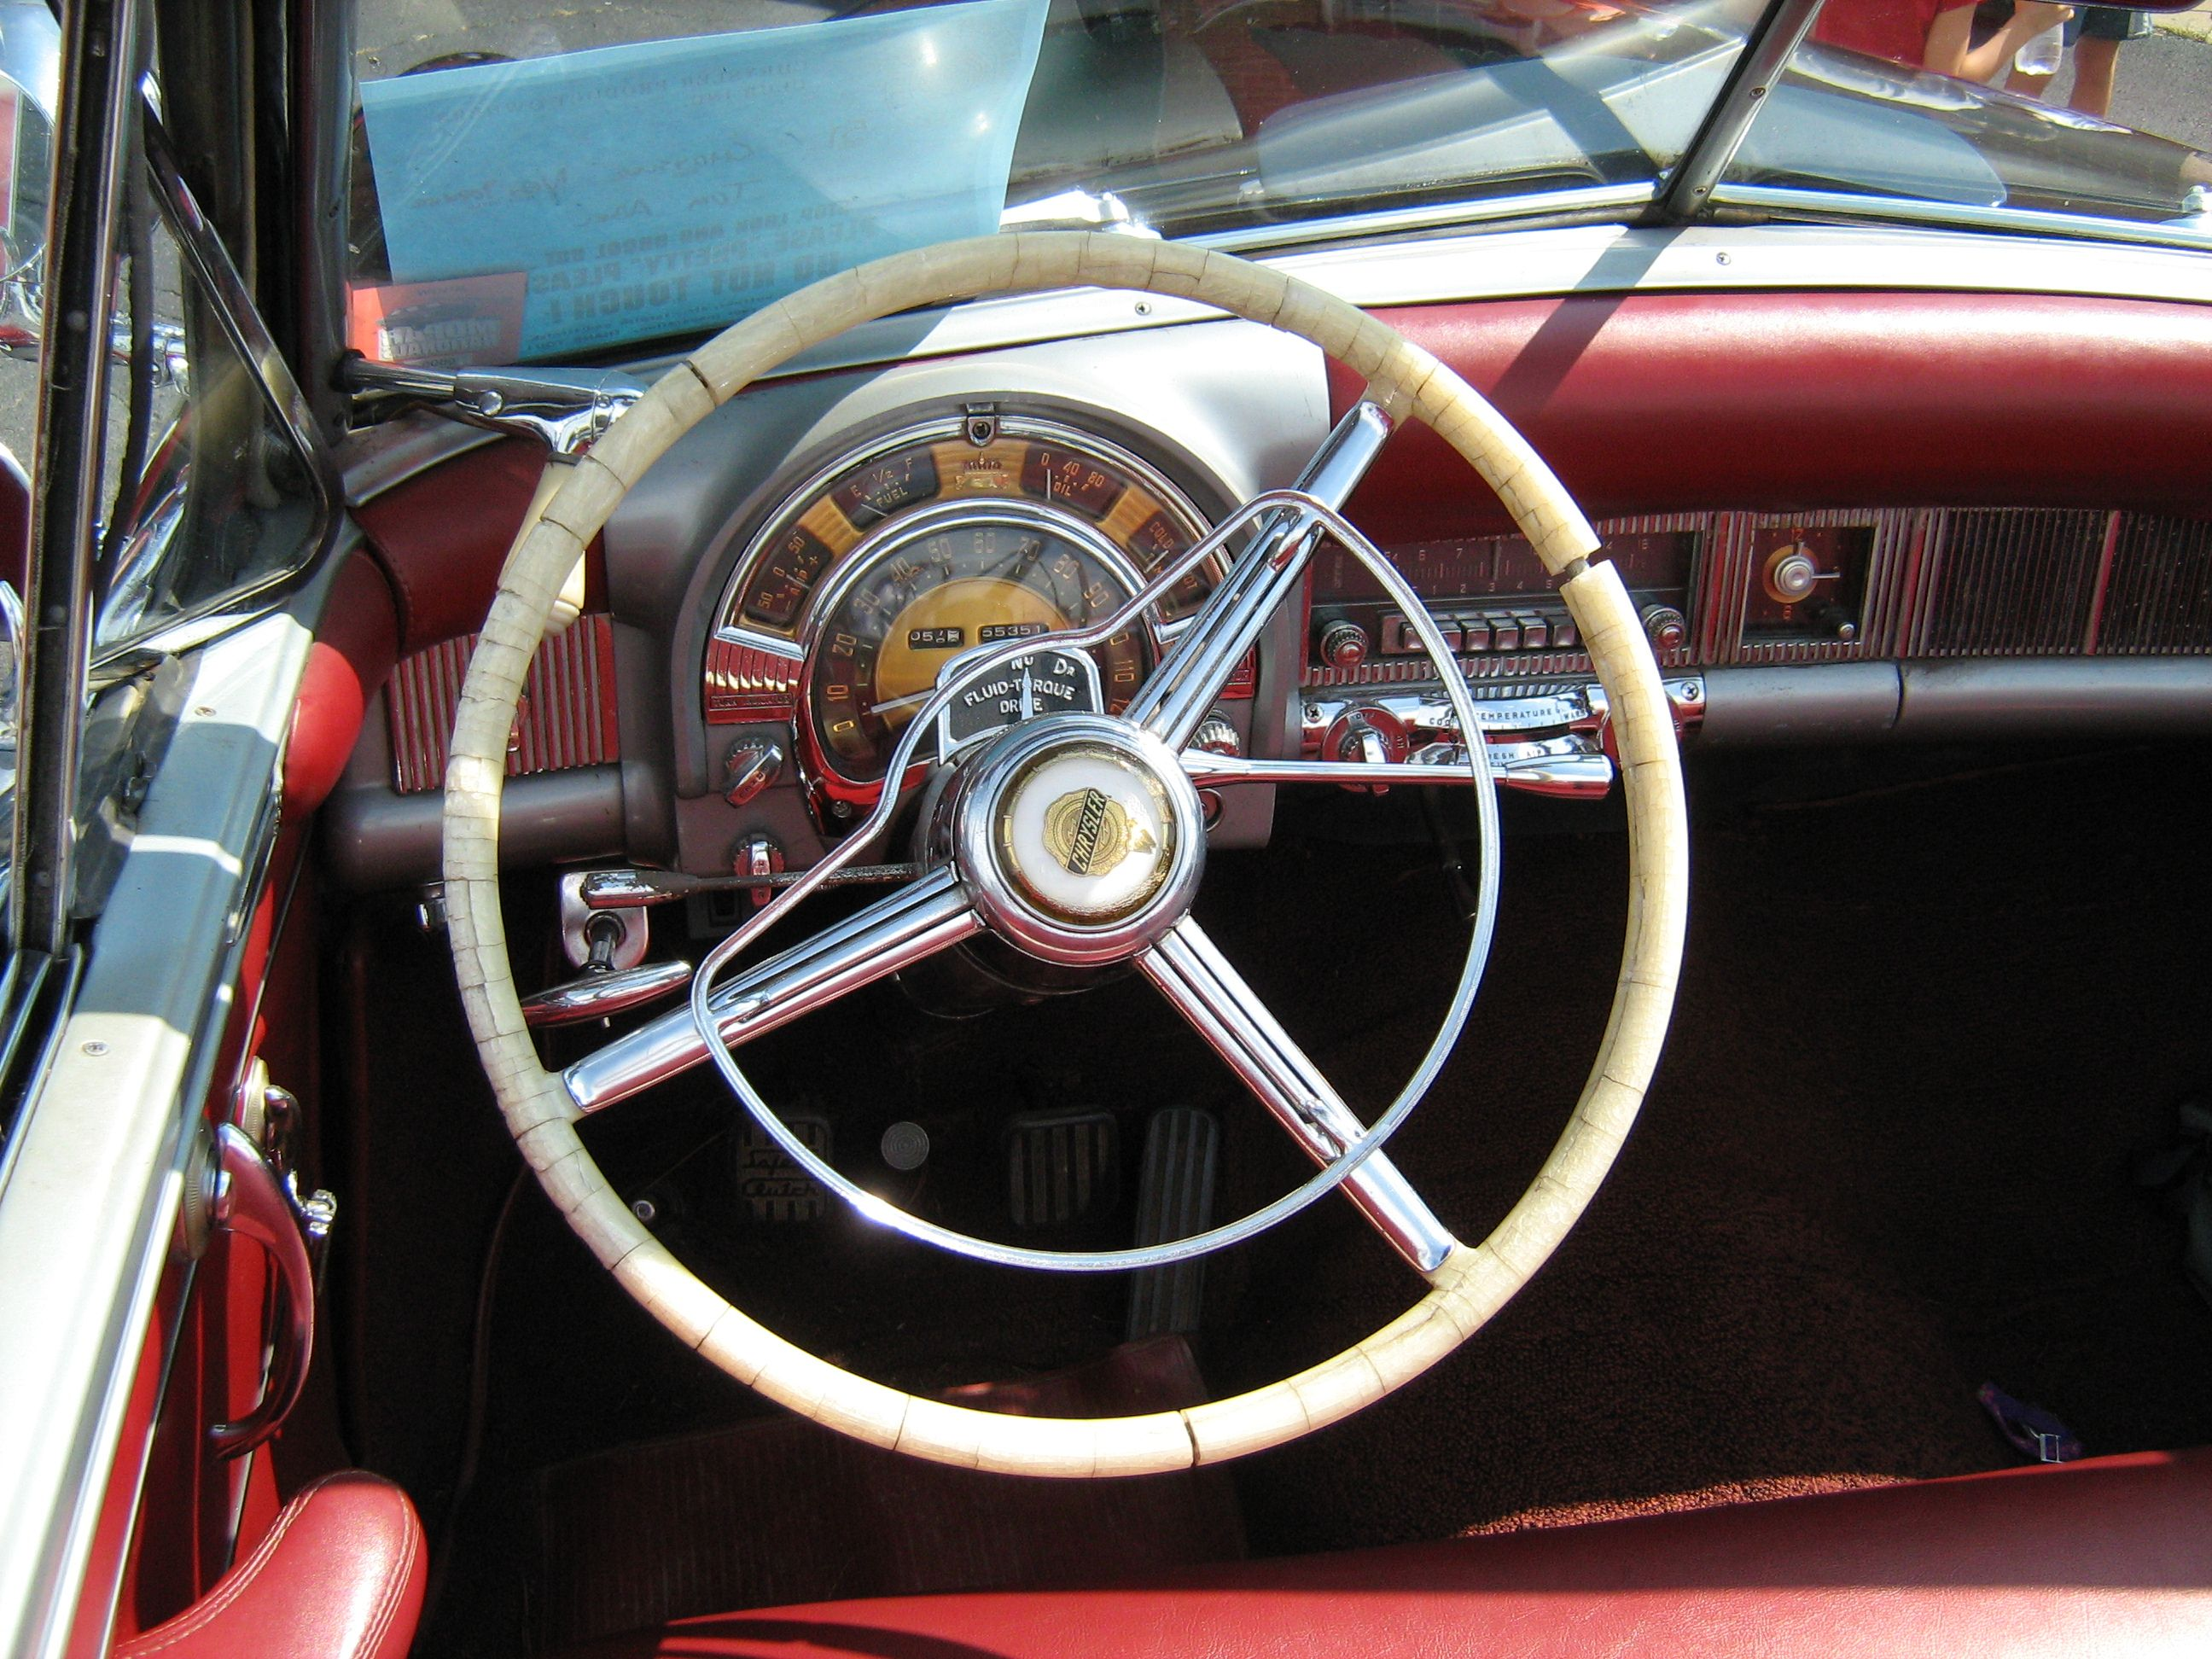 1956 chrysler imperial interior images - 1949 Chrysler Imperial Interior Login Edit